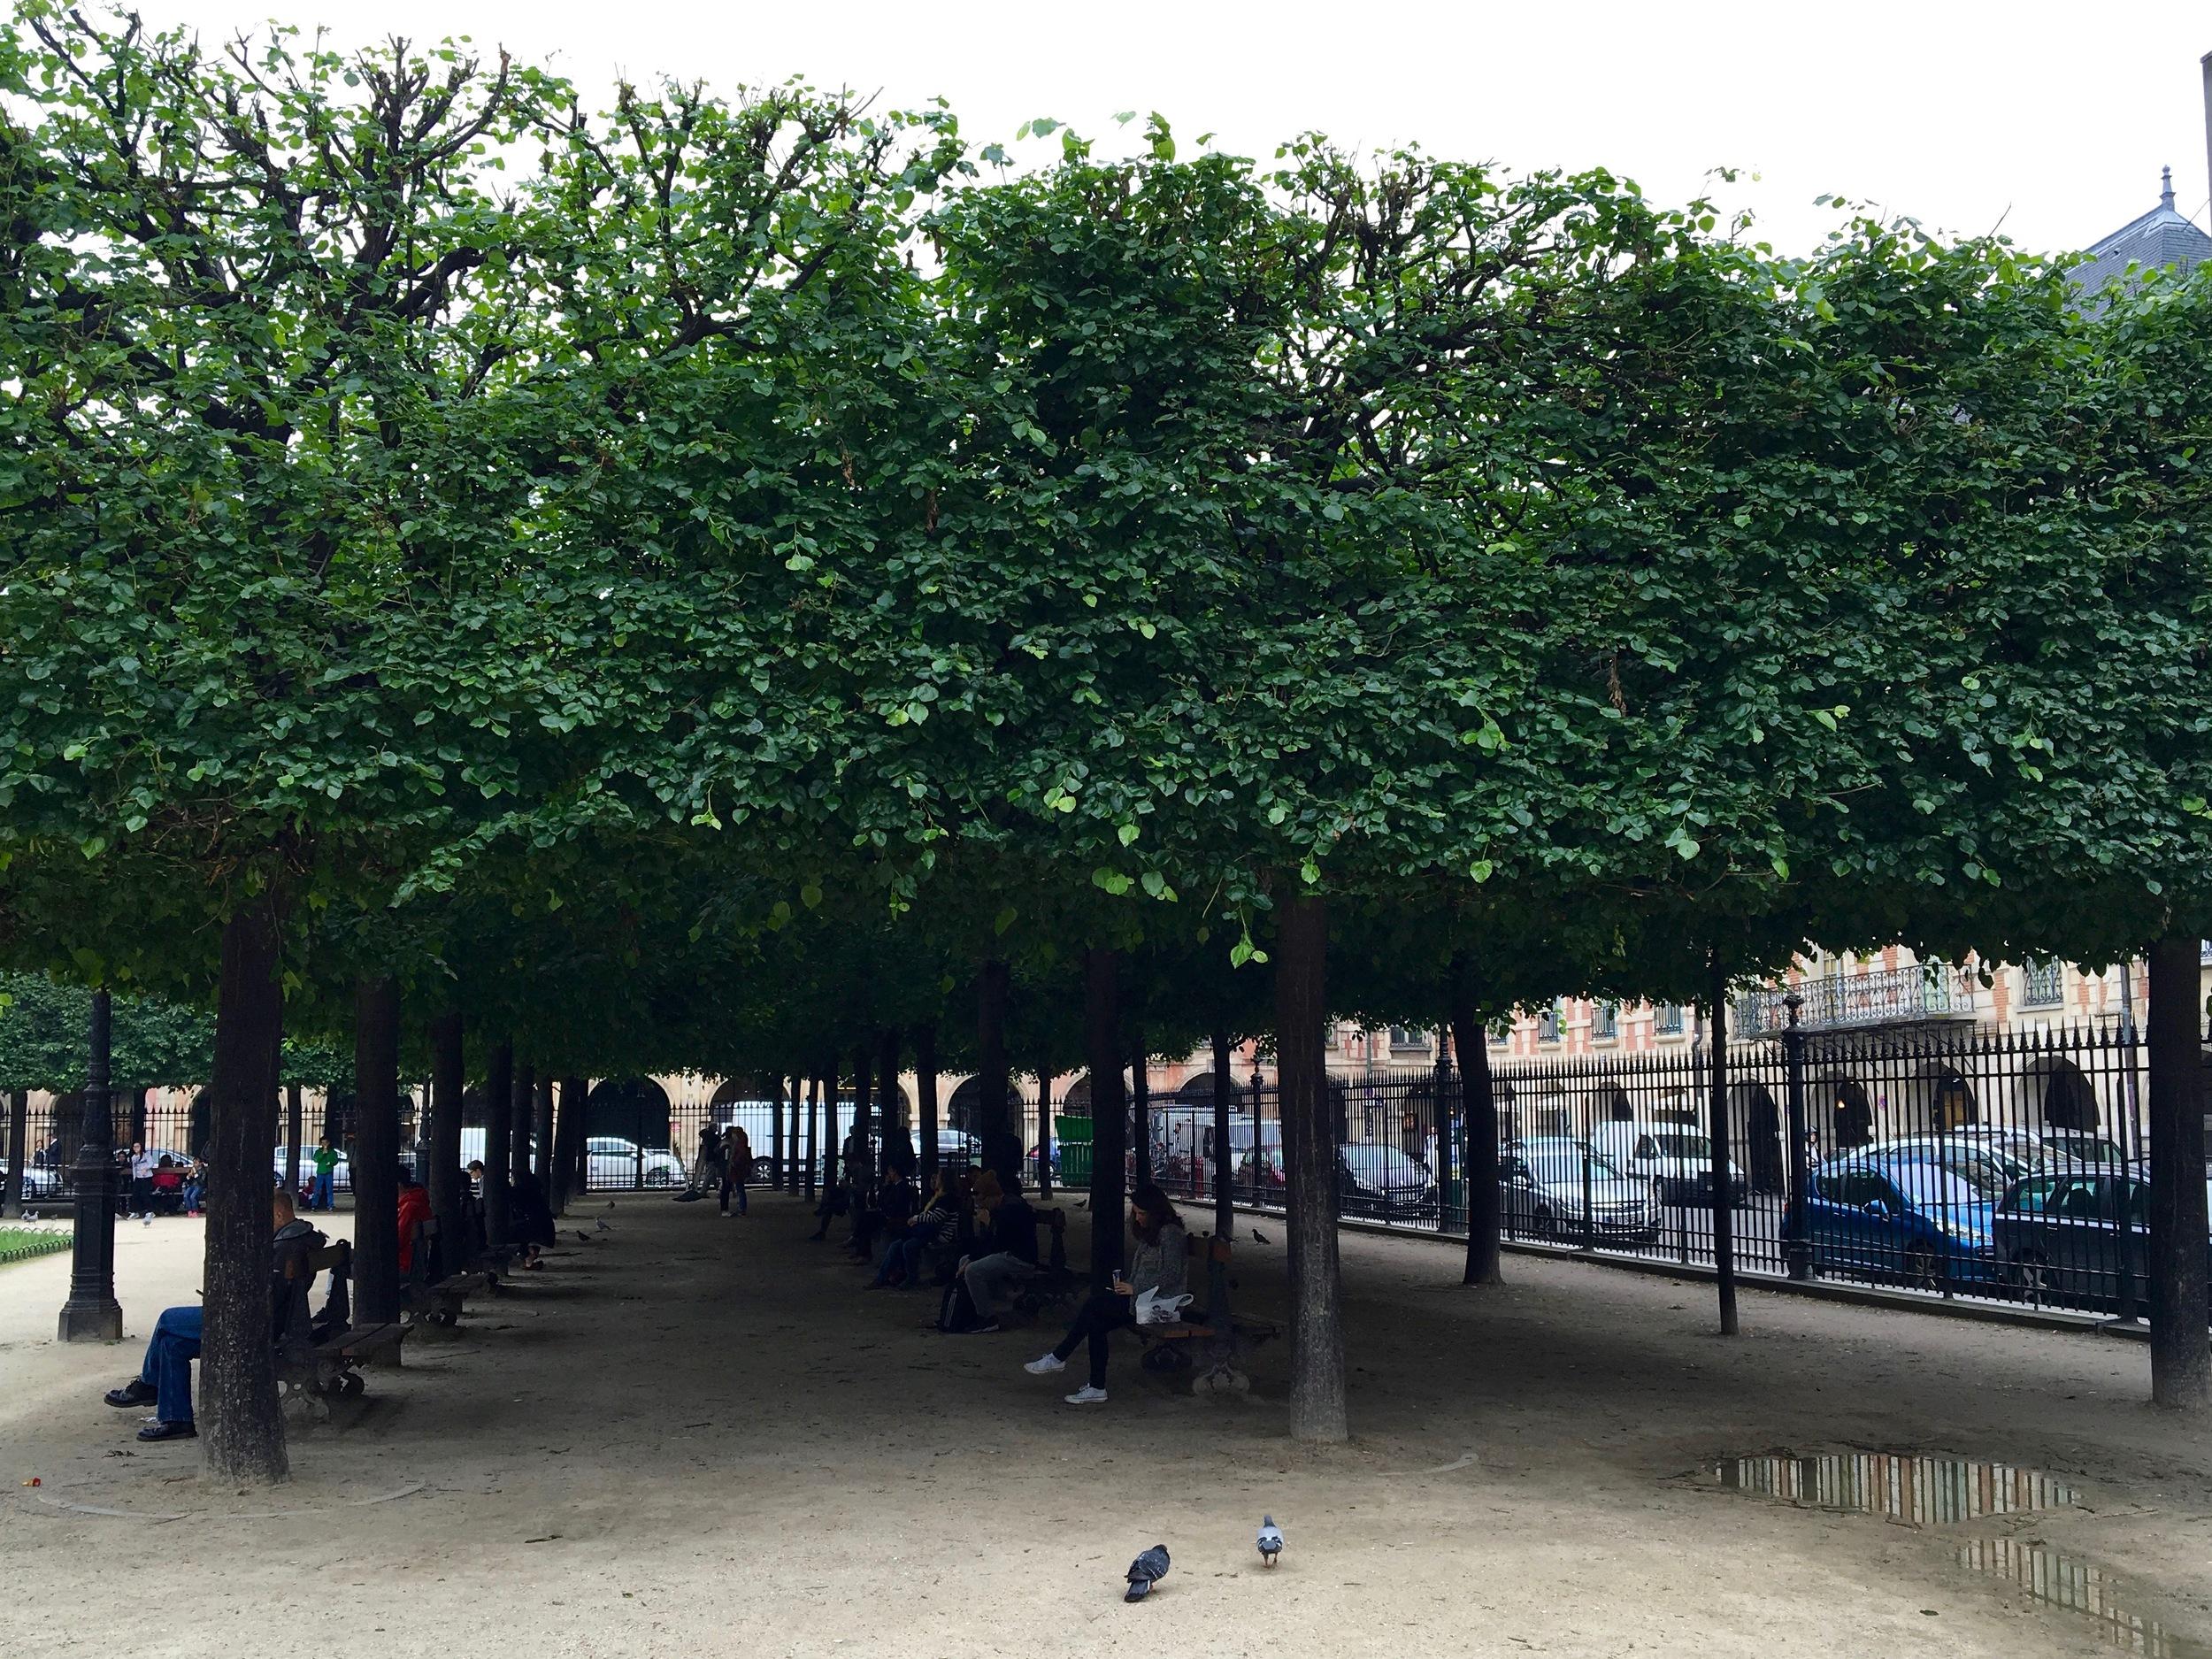 Lunching under rectangular trees